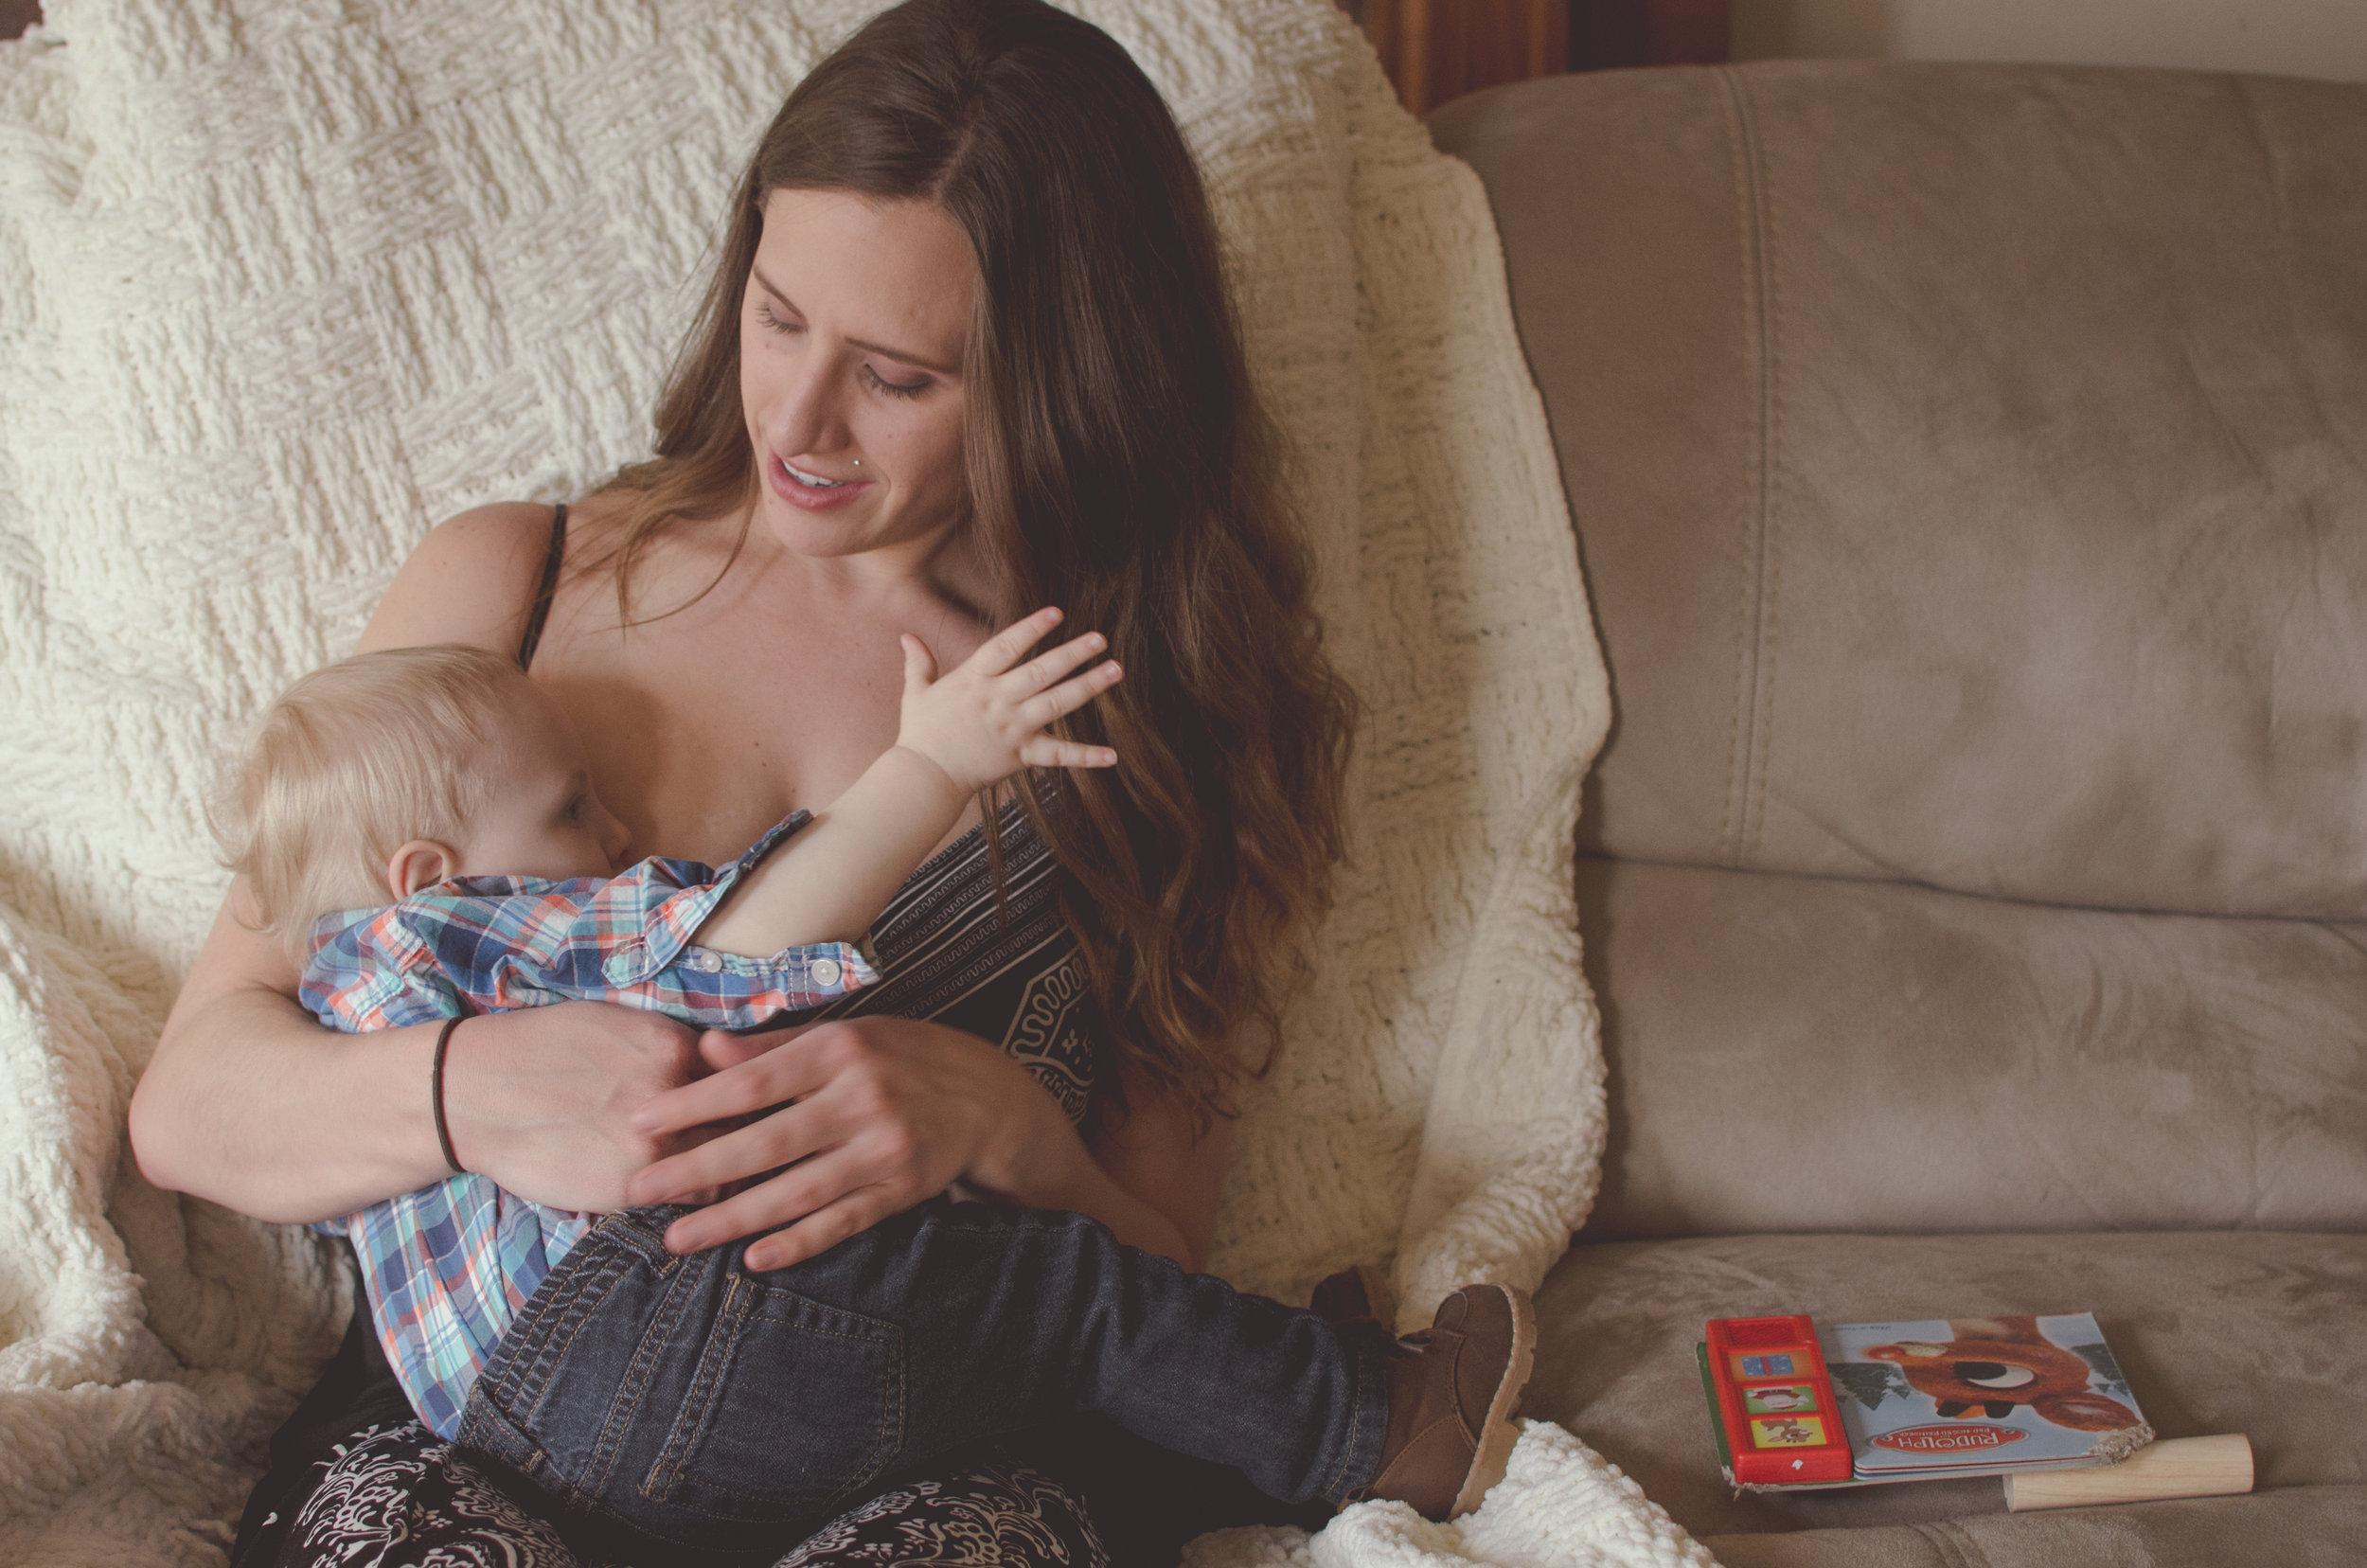 Distracted nurser, breastfeed indoors, extended breastfeeding